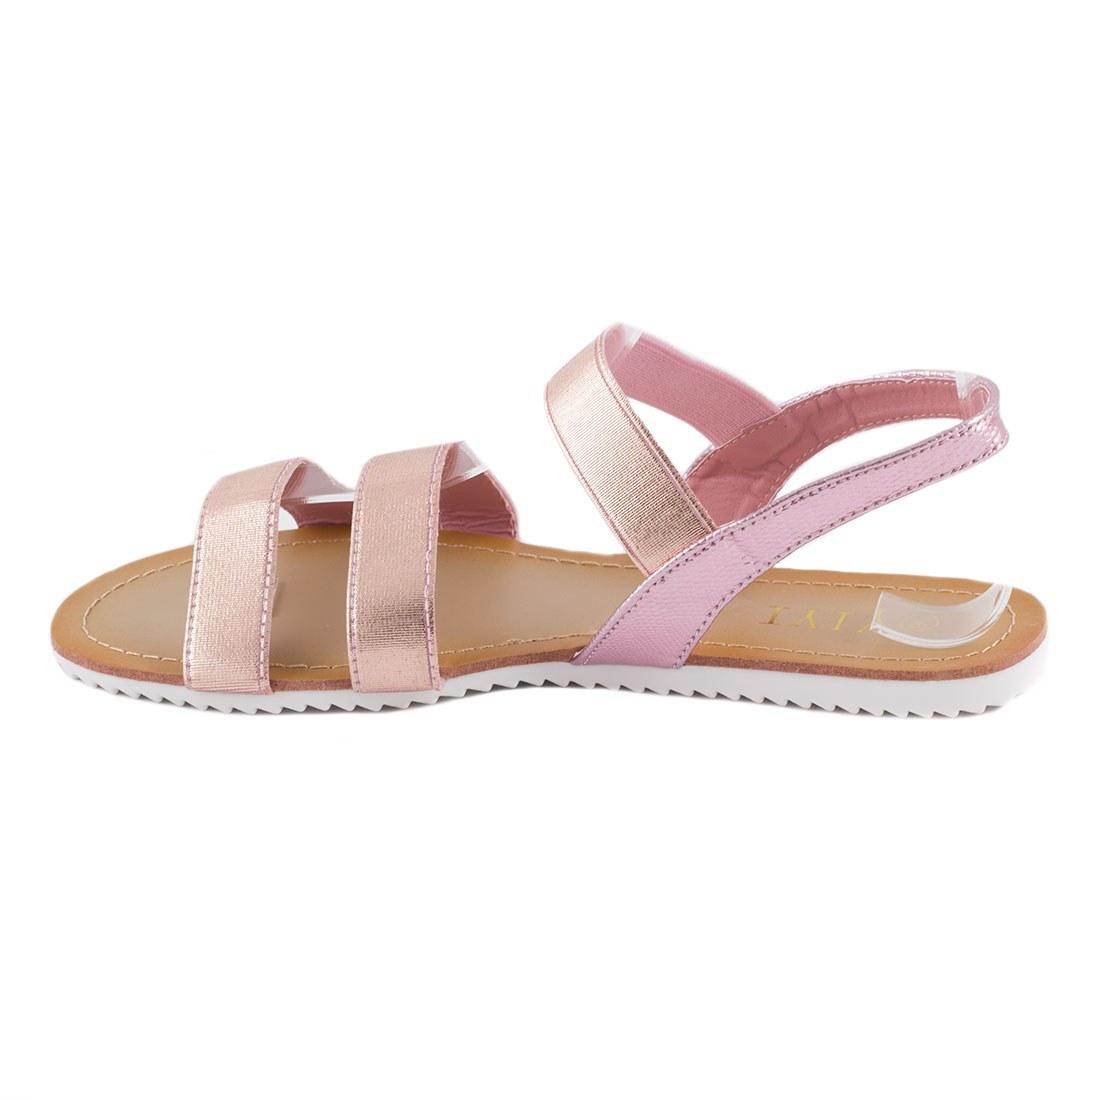 Sandale dama cu talpa joasa K-58-ROZ